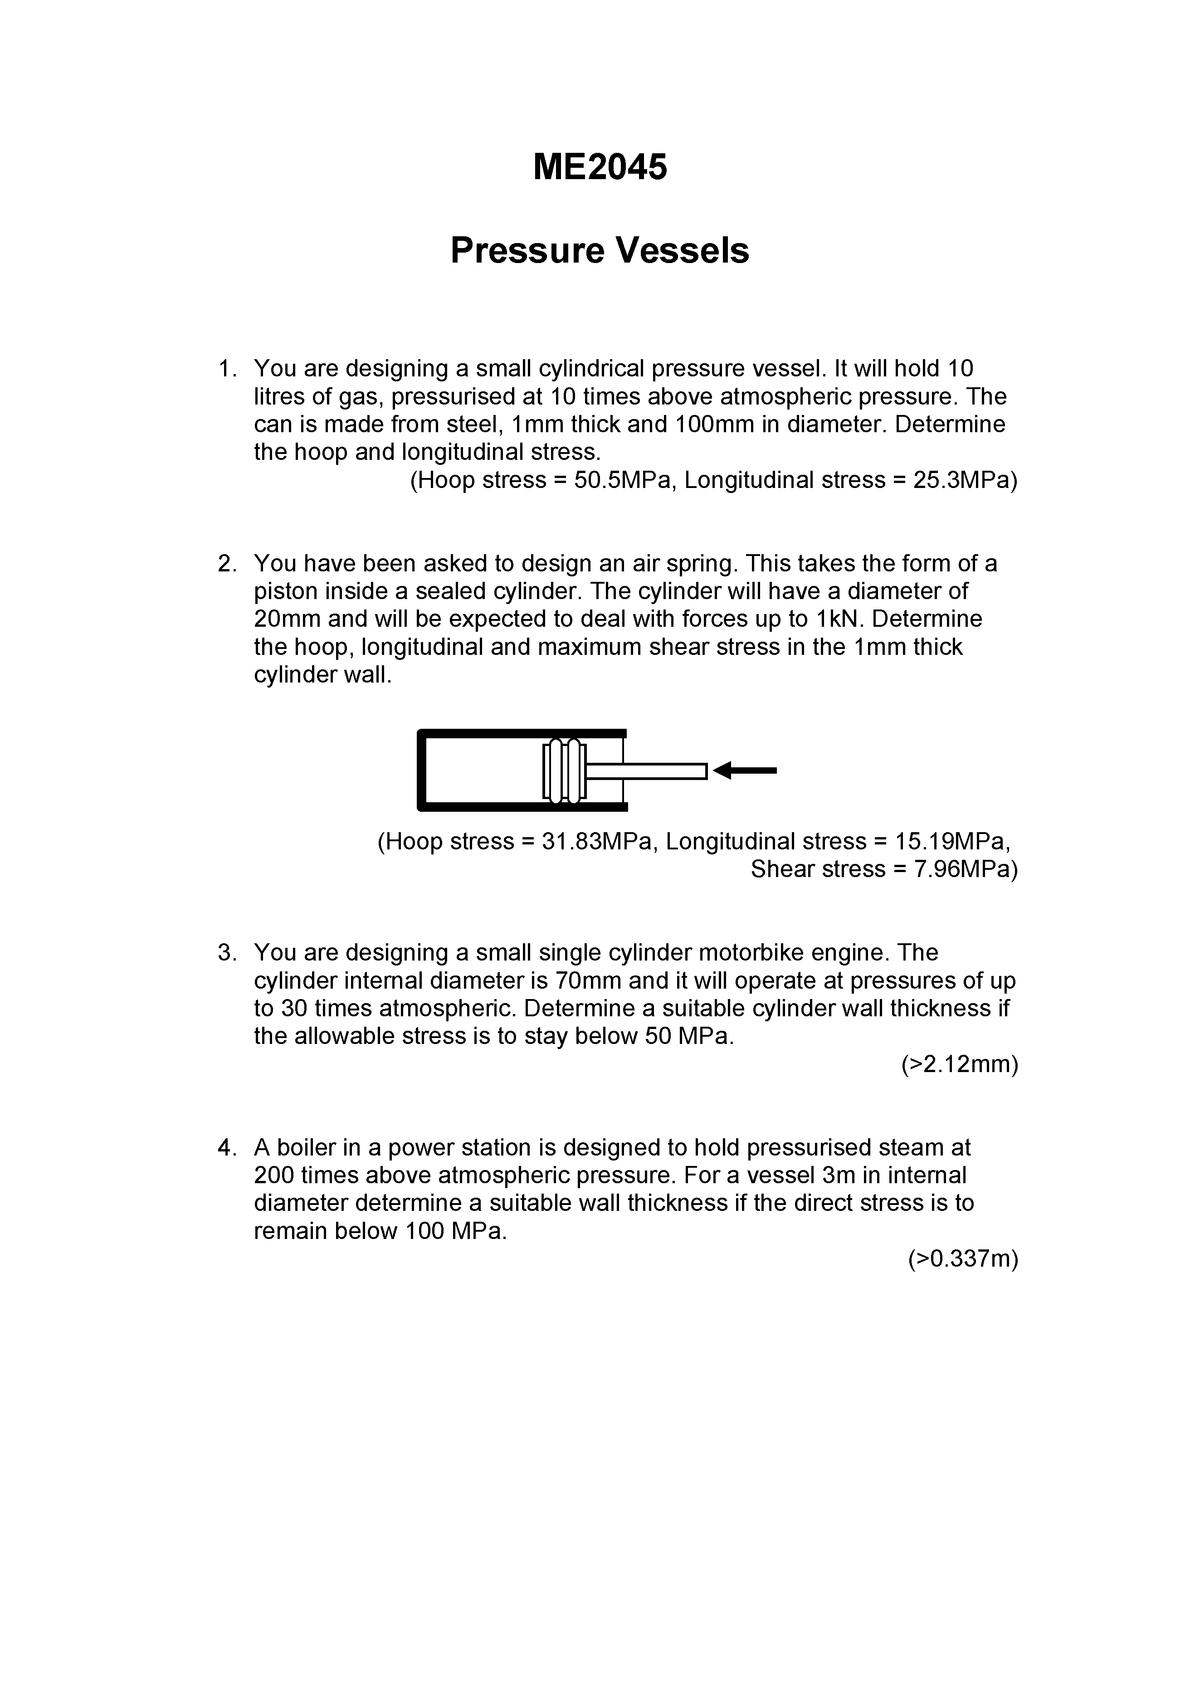 ME2045 Pressure Vessel Tutorial - ME2045: Solid Mechanics